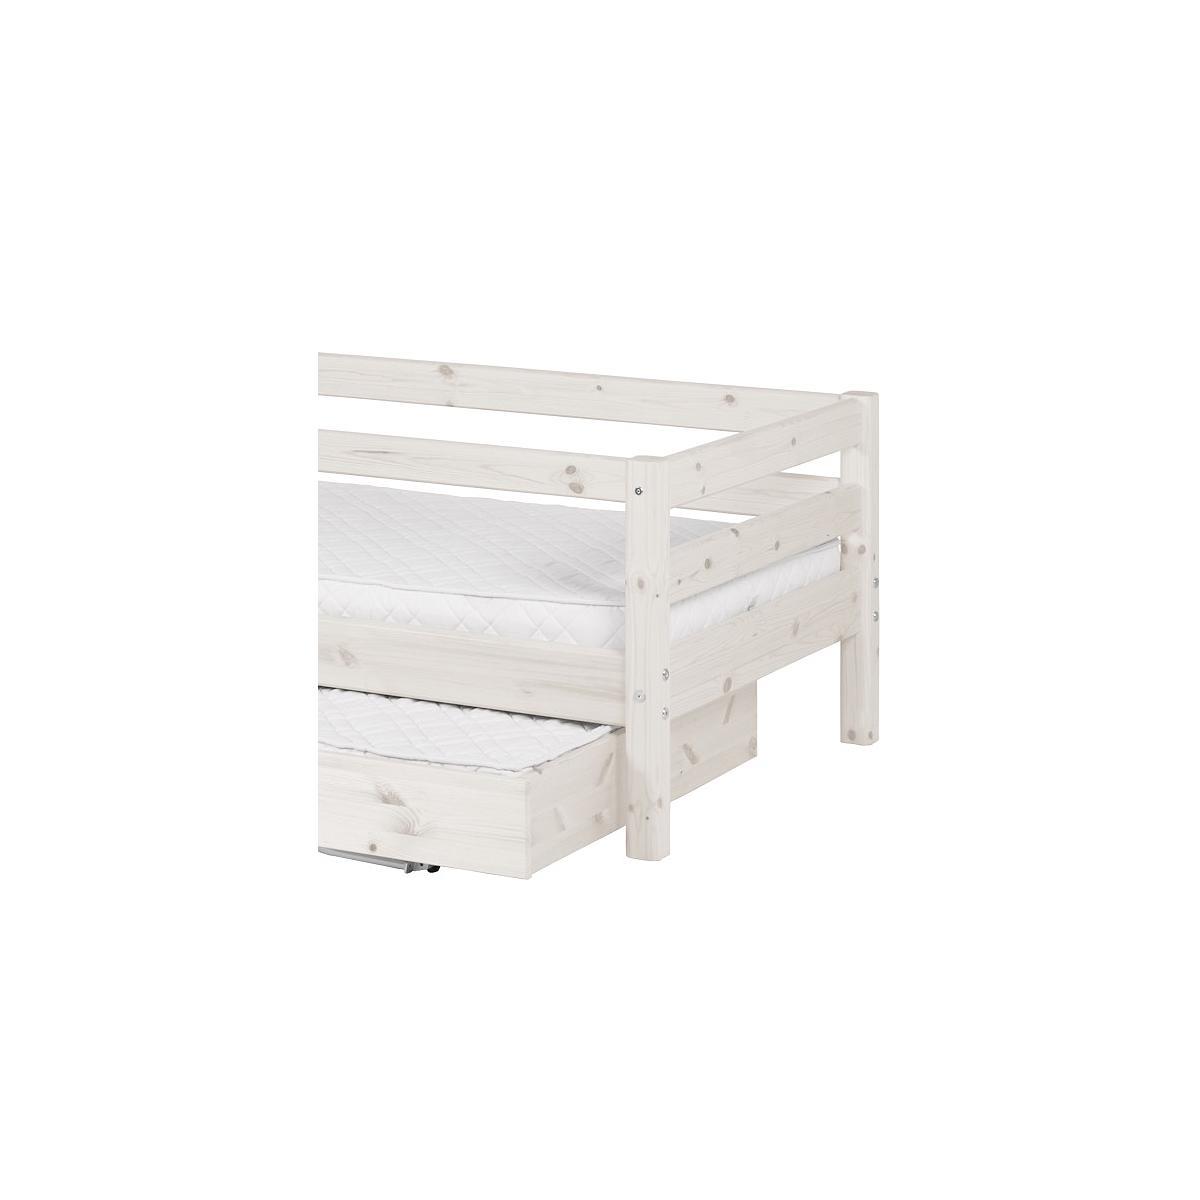 Sofá Cama nido 90x200 CLASSIC Flexa blanco cal